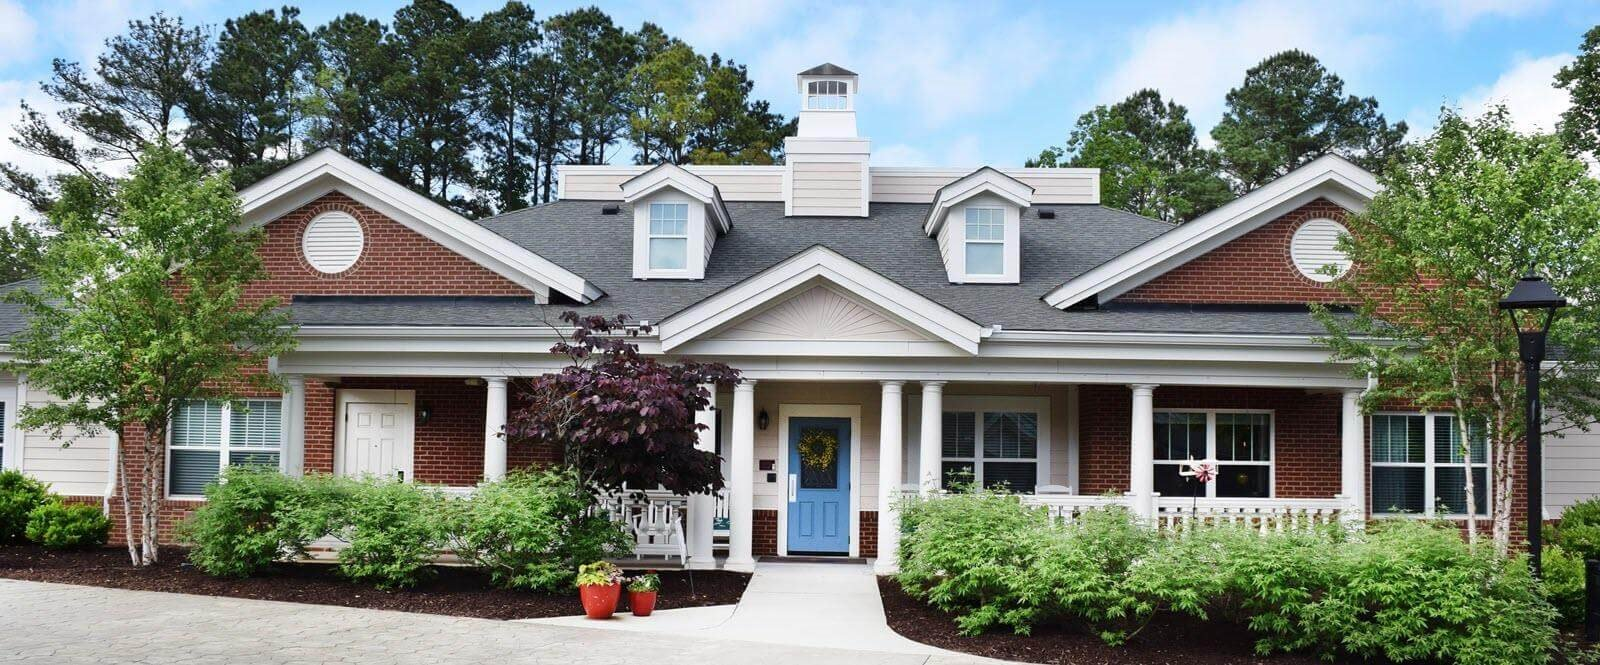 Main Entrance To Property at Spring Arbor Cottage of Richmond, VA, Richmond, 23233